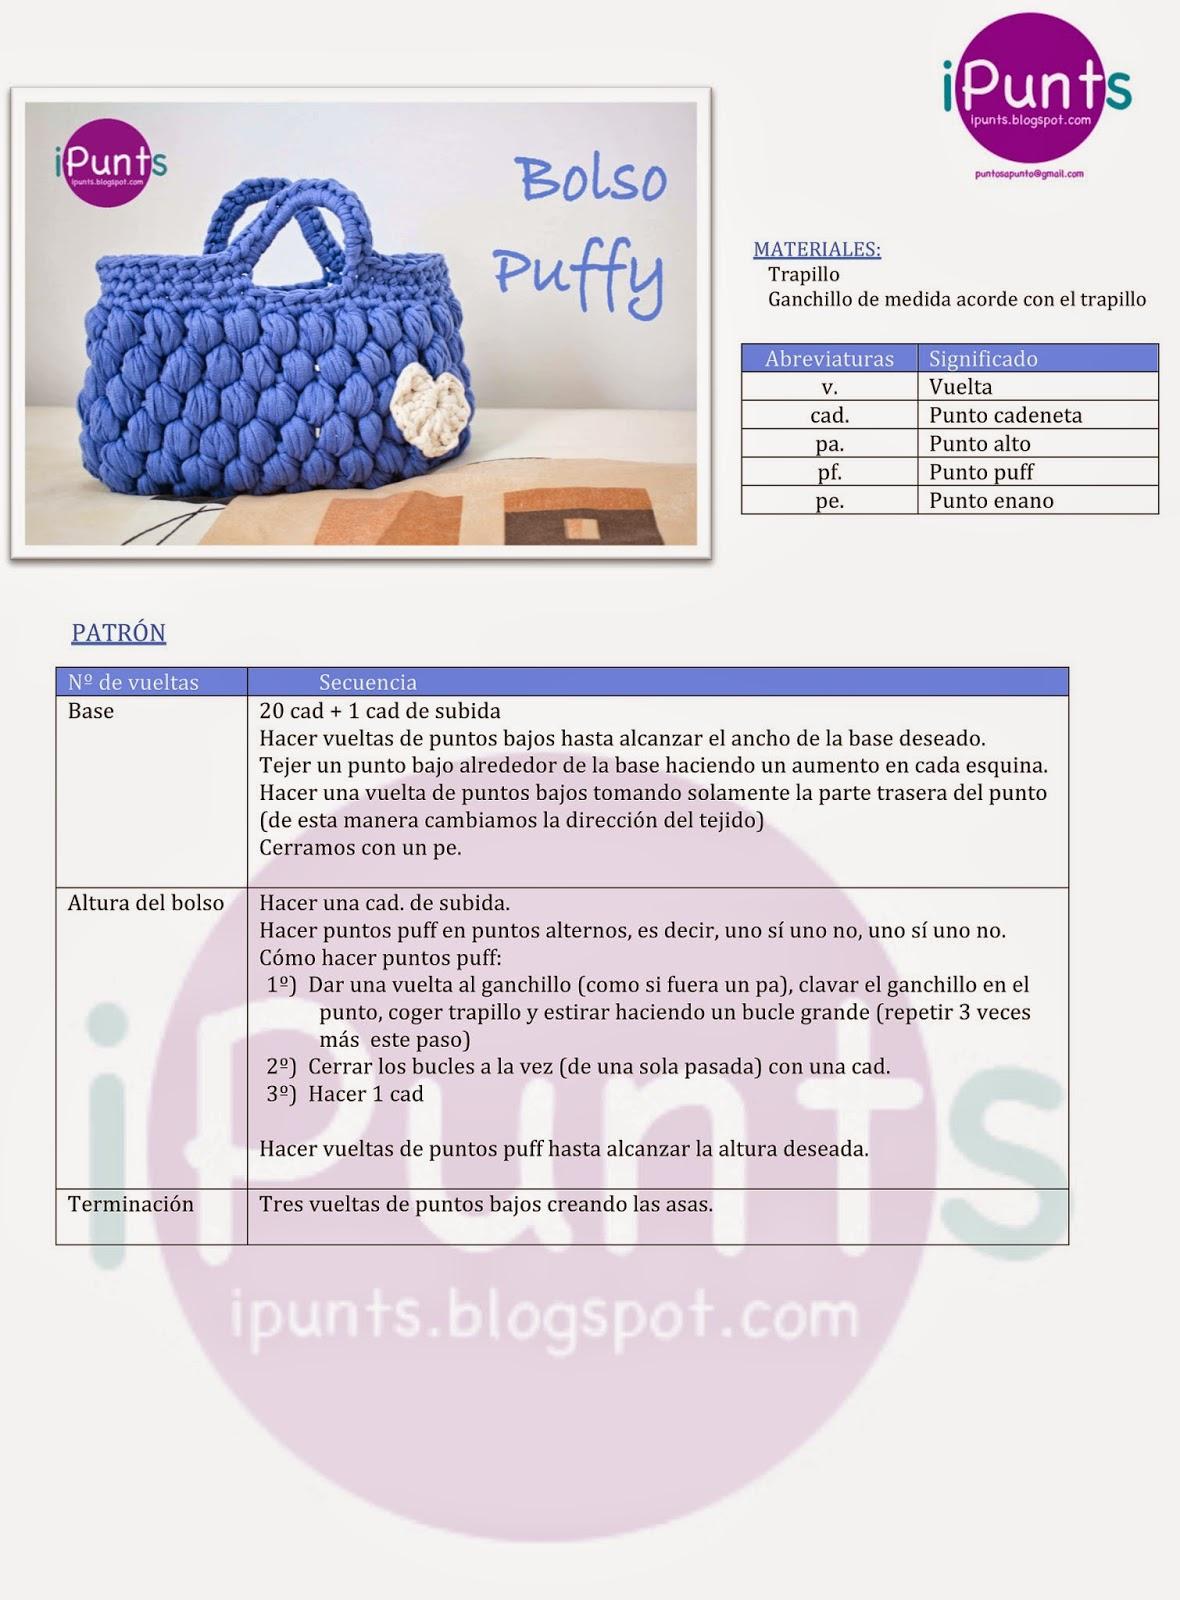 iPunts: Videotutorial: Bolso de trapillo Puffy (punto Puff a crochet)